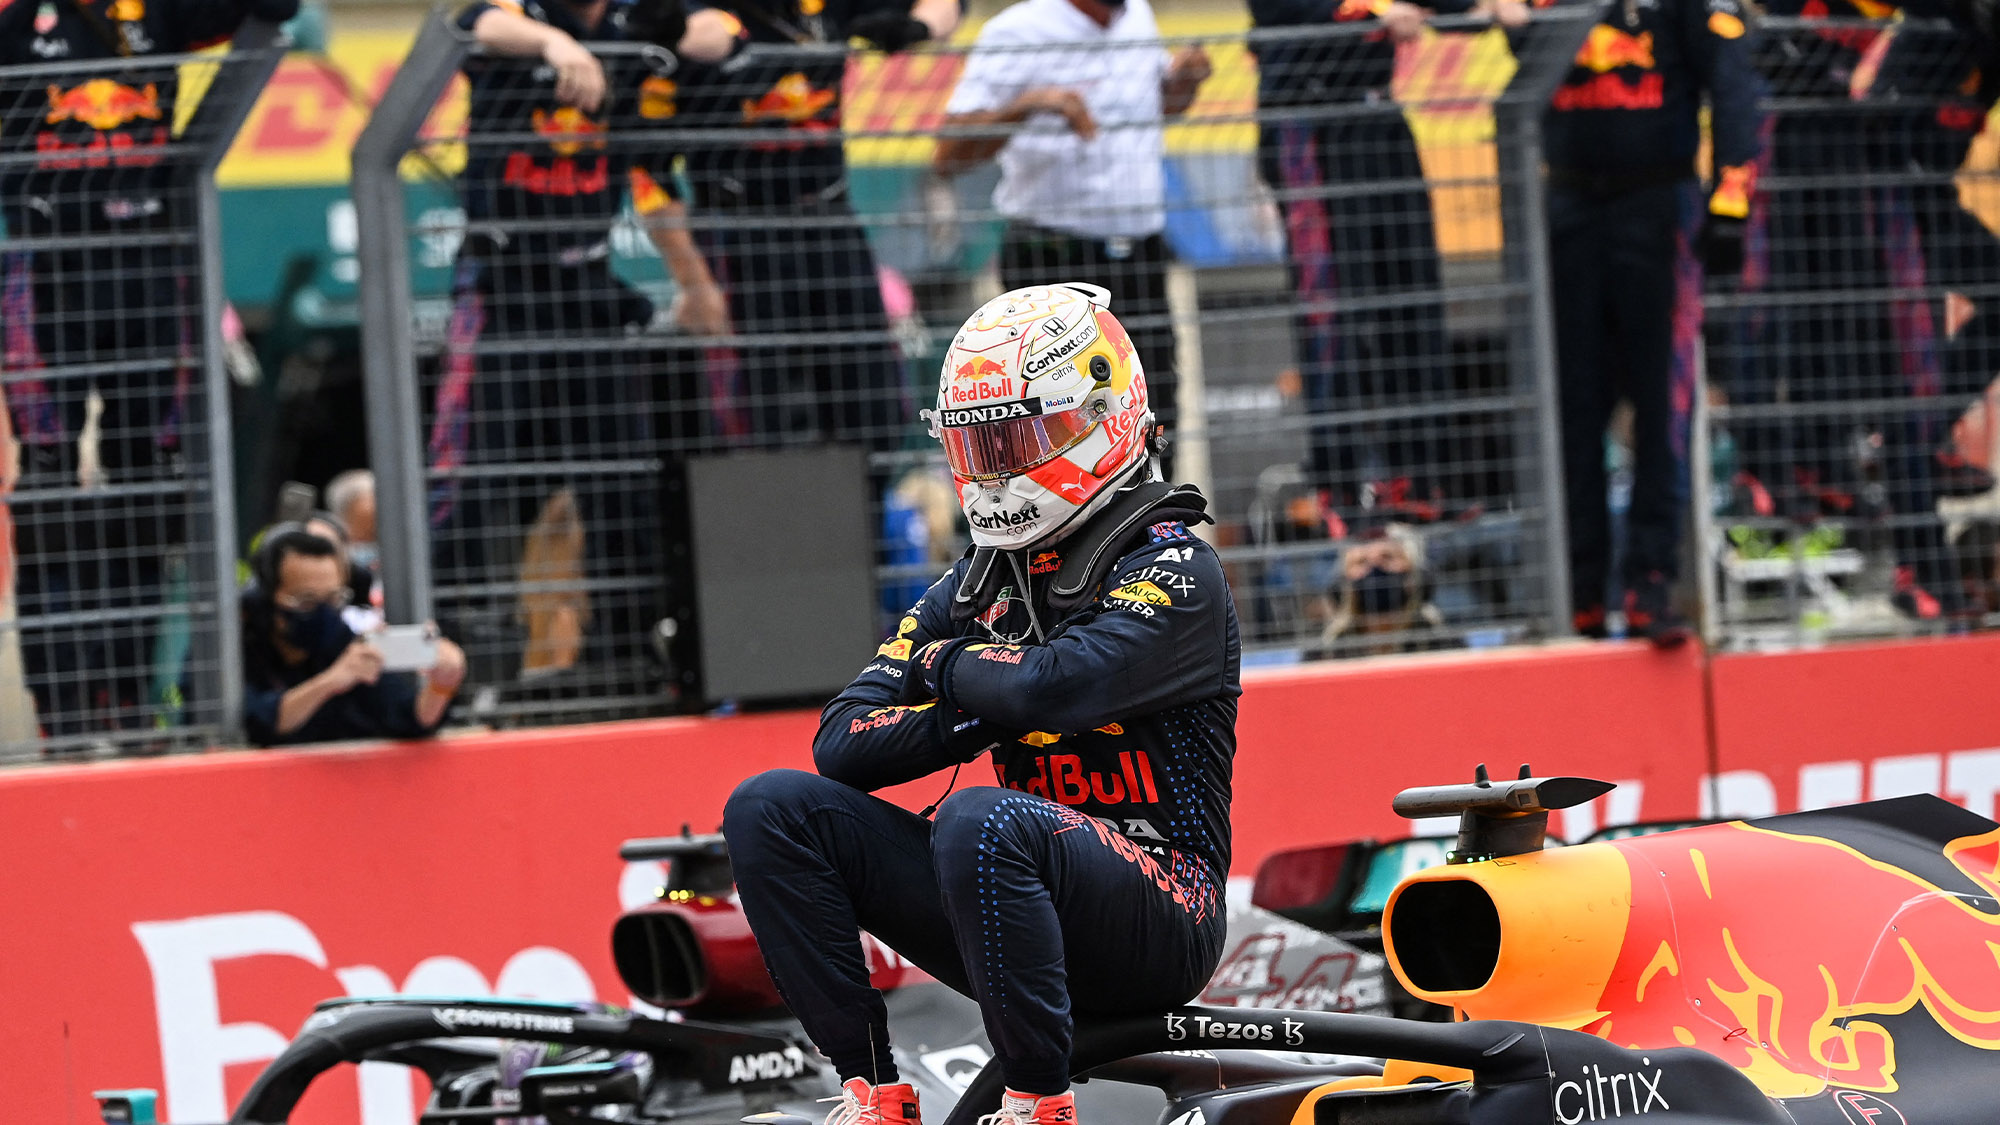 Max Verstappen celebrates winning the 2021 French Grand Prix